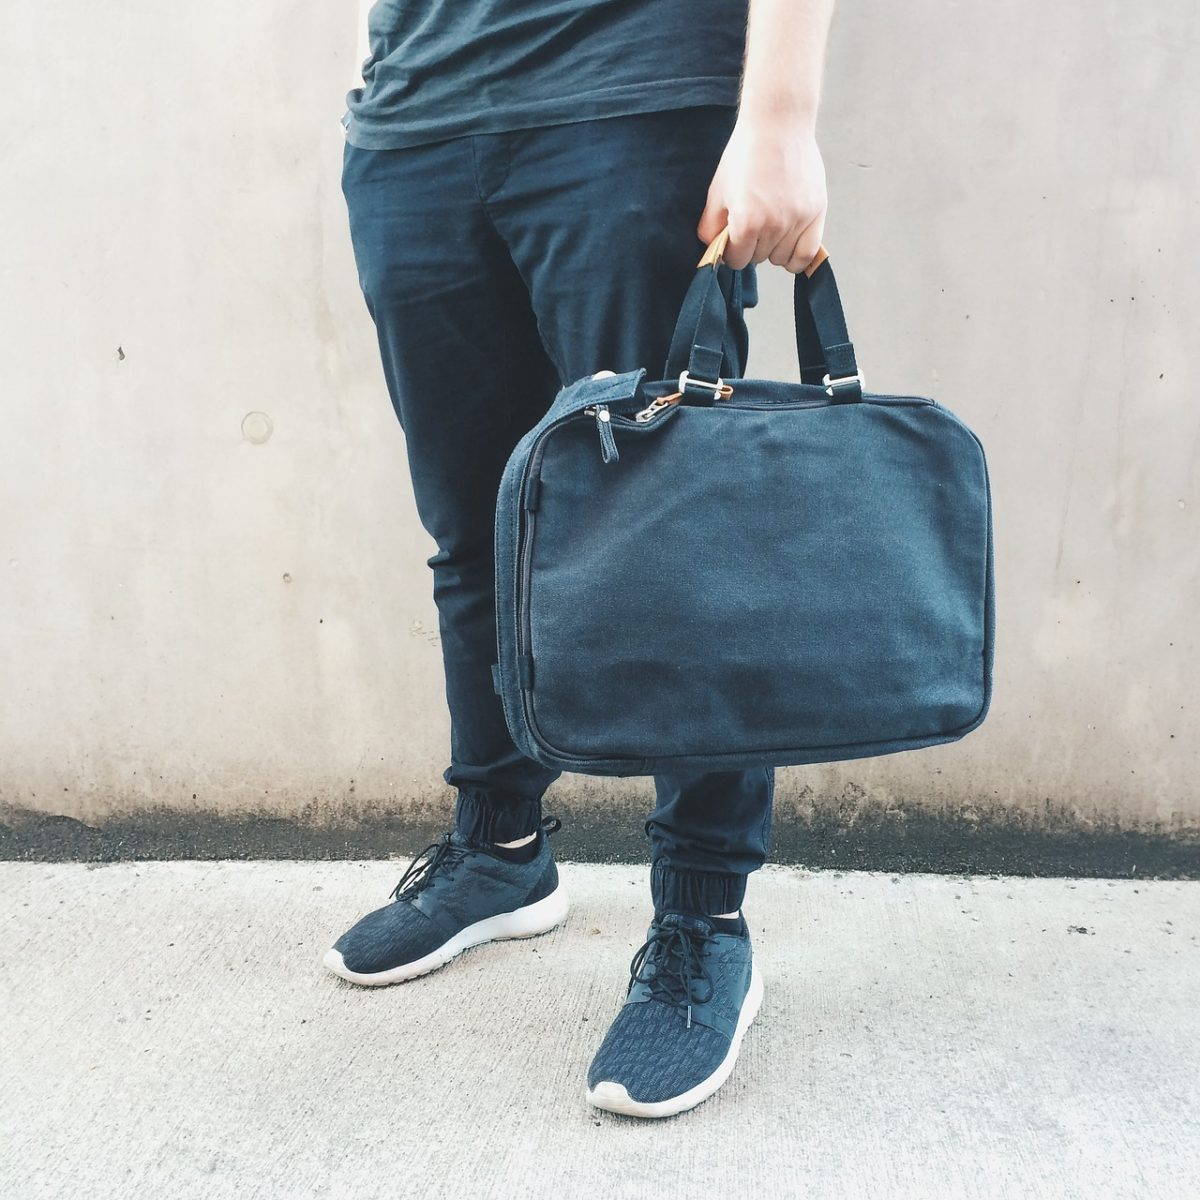 bag-1844806_1280